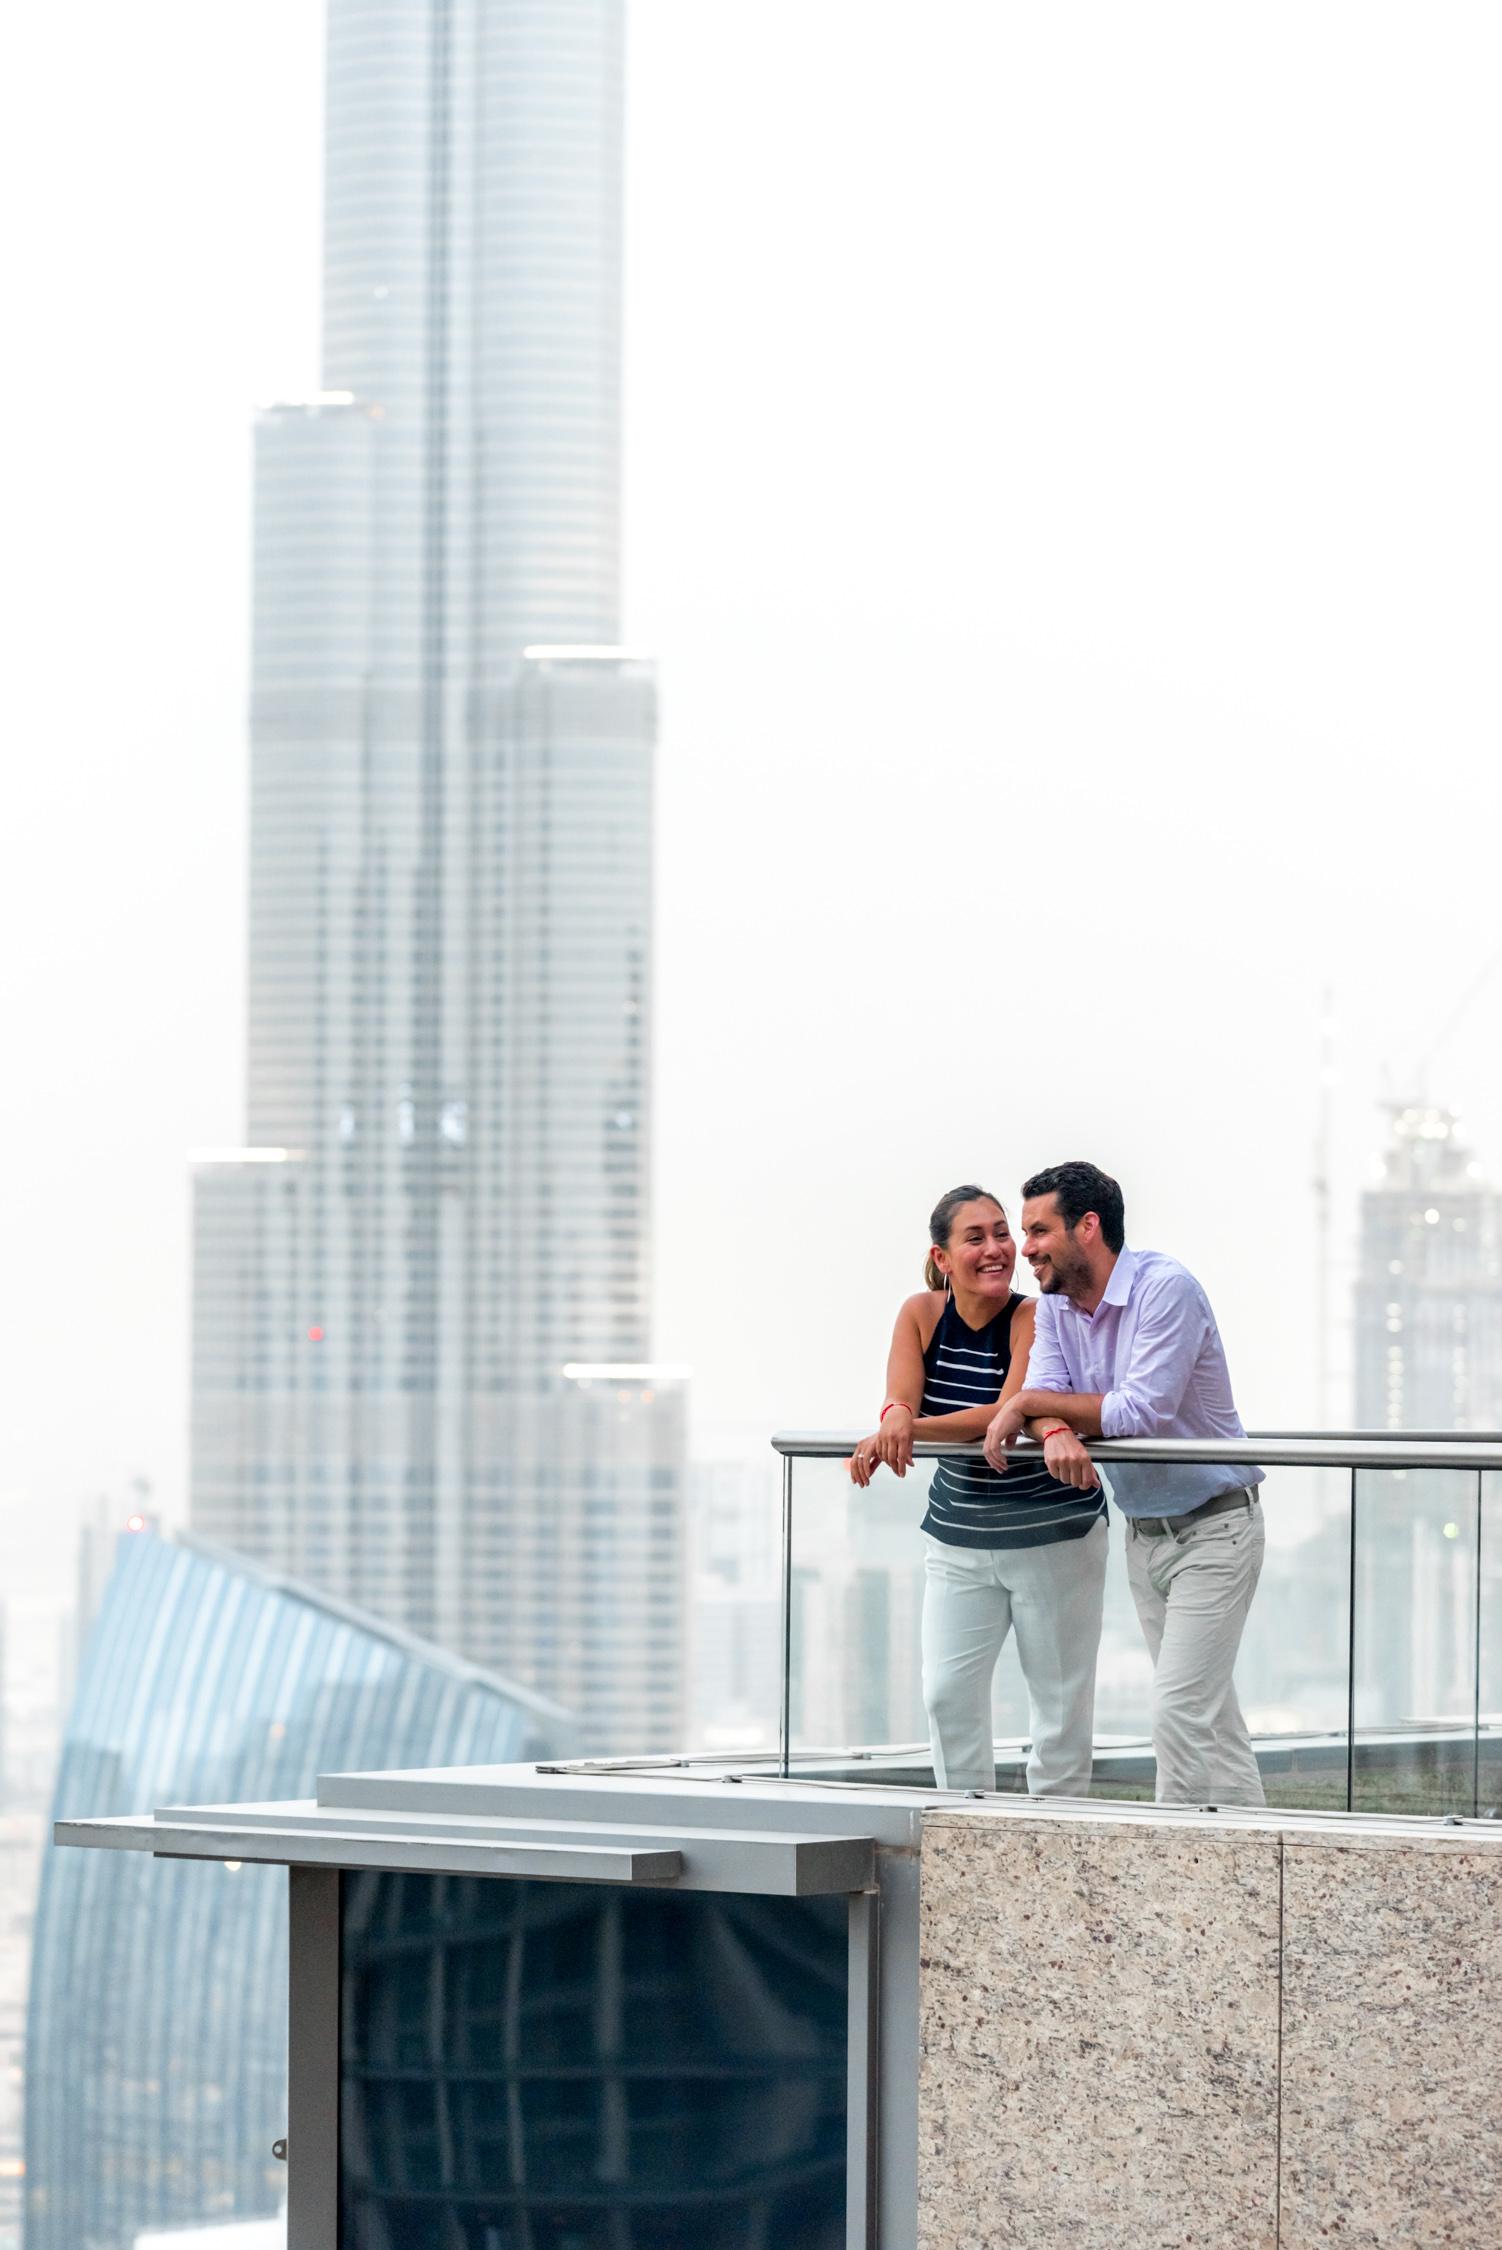 Dubai-426-20180512.jpg